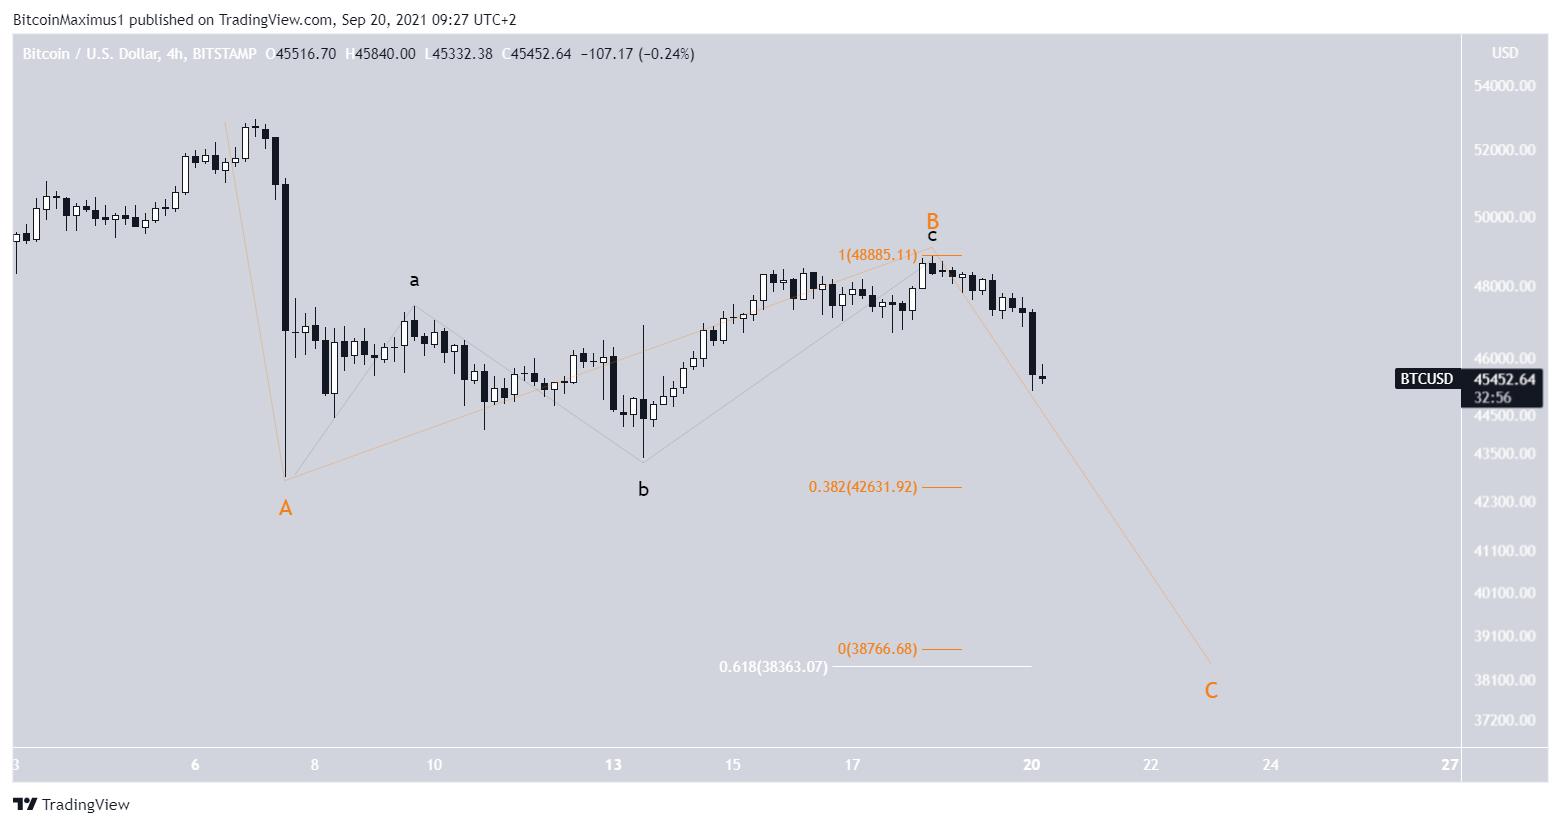 Bitcoin Kurs Preis Chart BTC 20. September 2021 Prognose 4